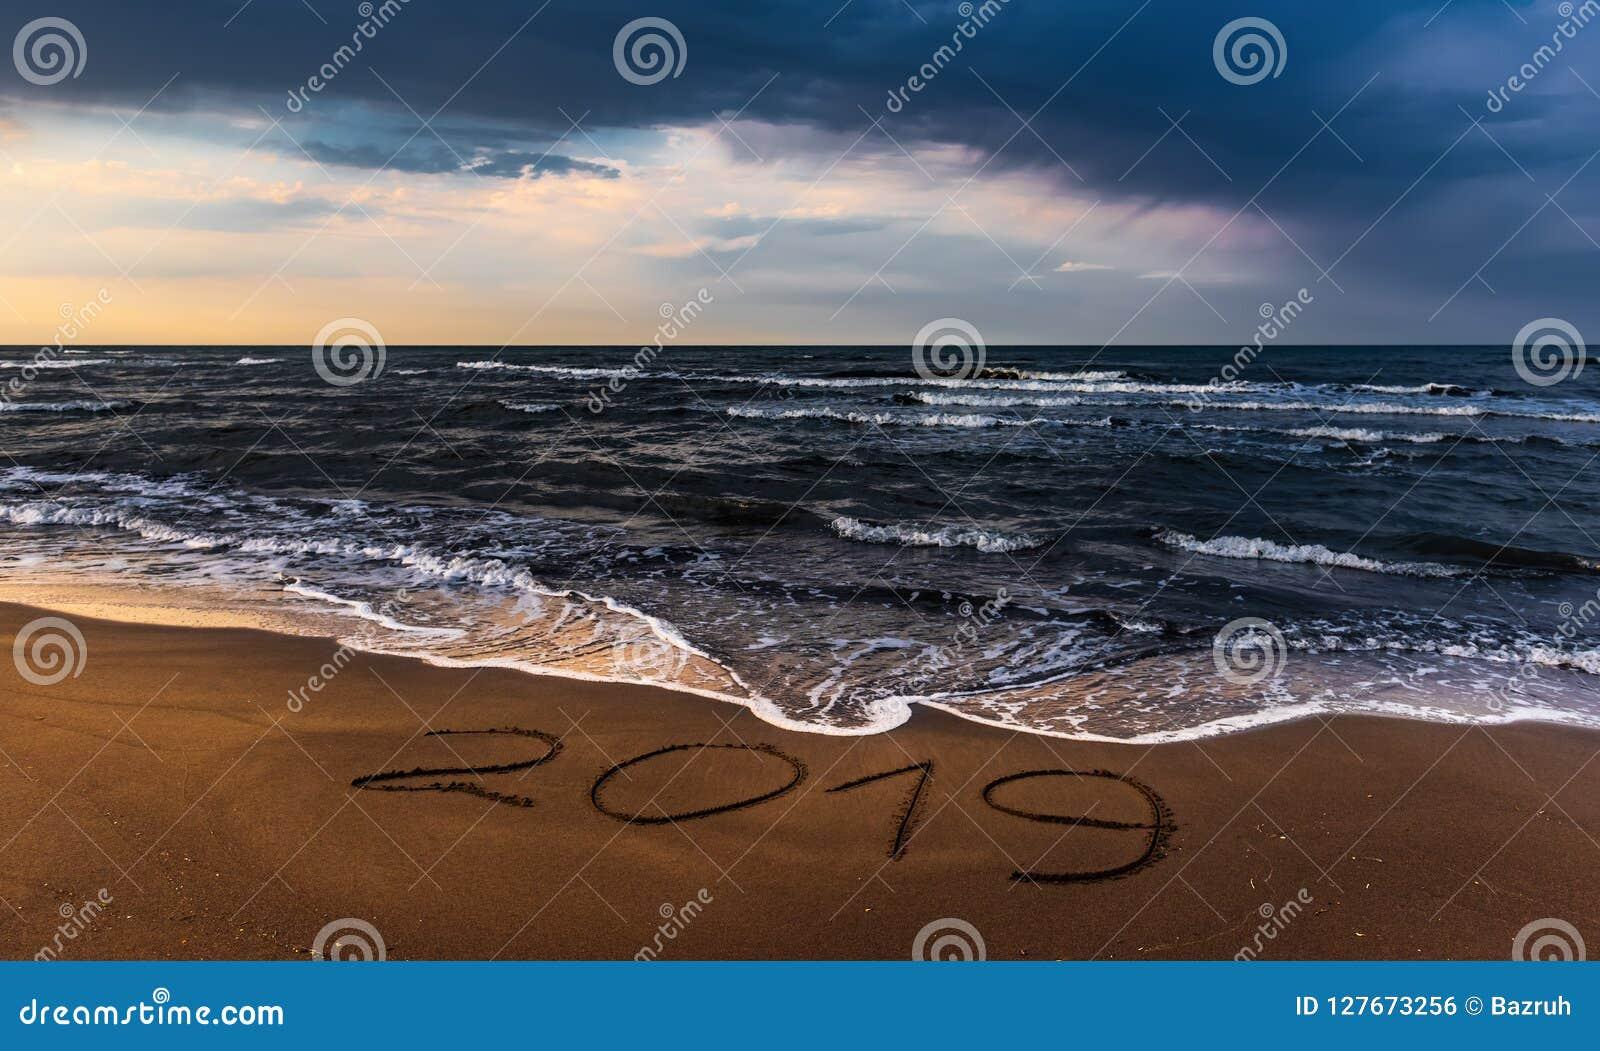 Amazing colorful sky over sea, empty beach